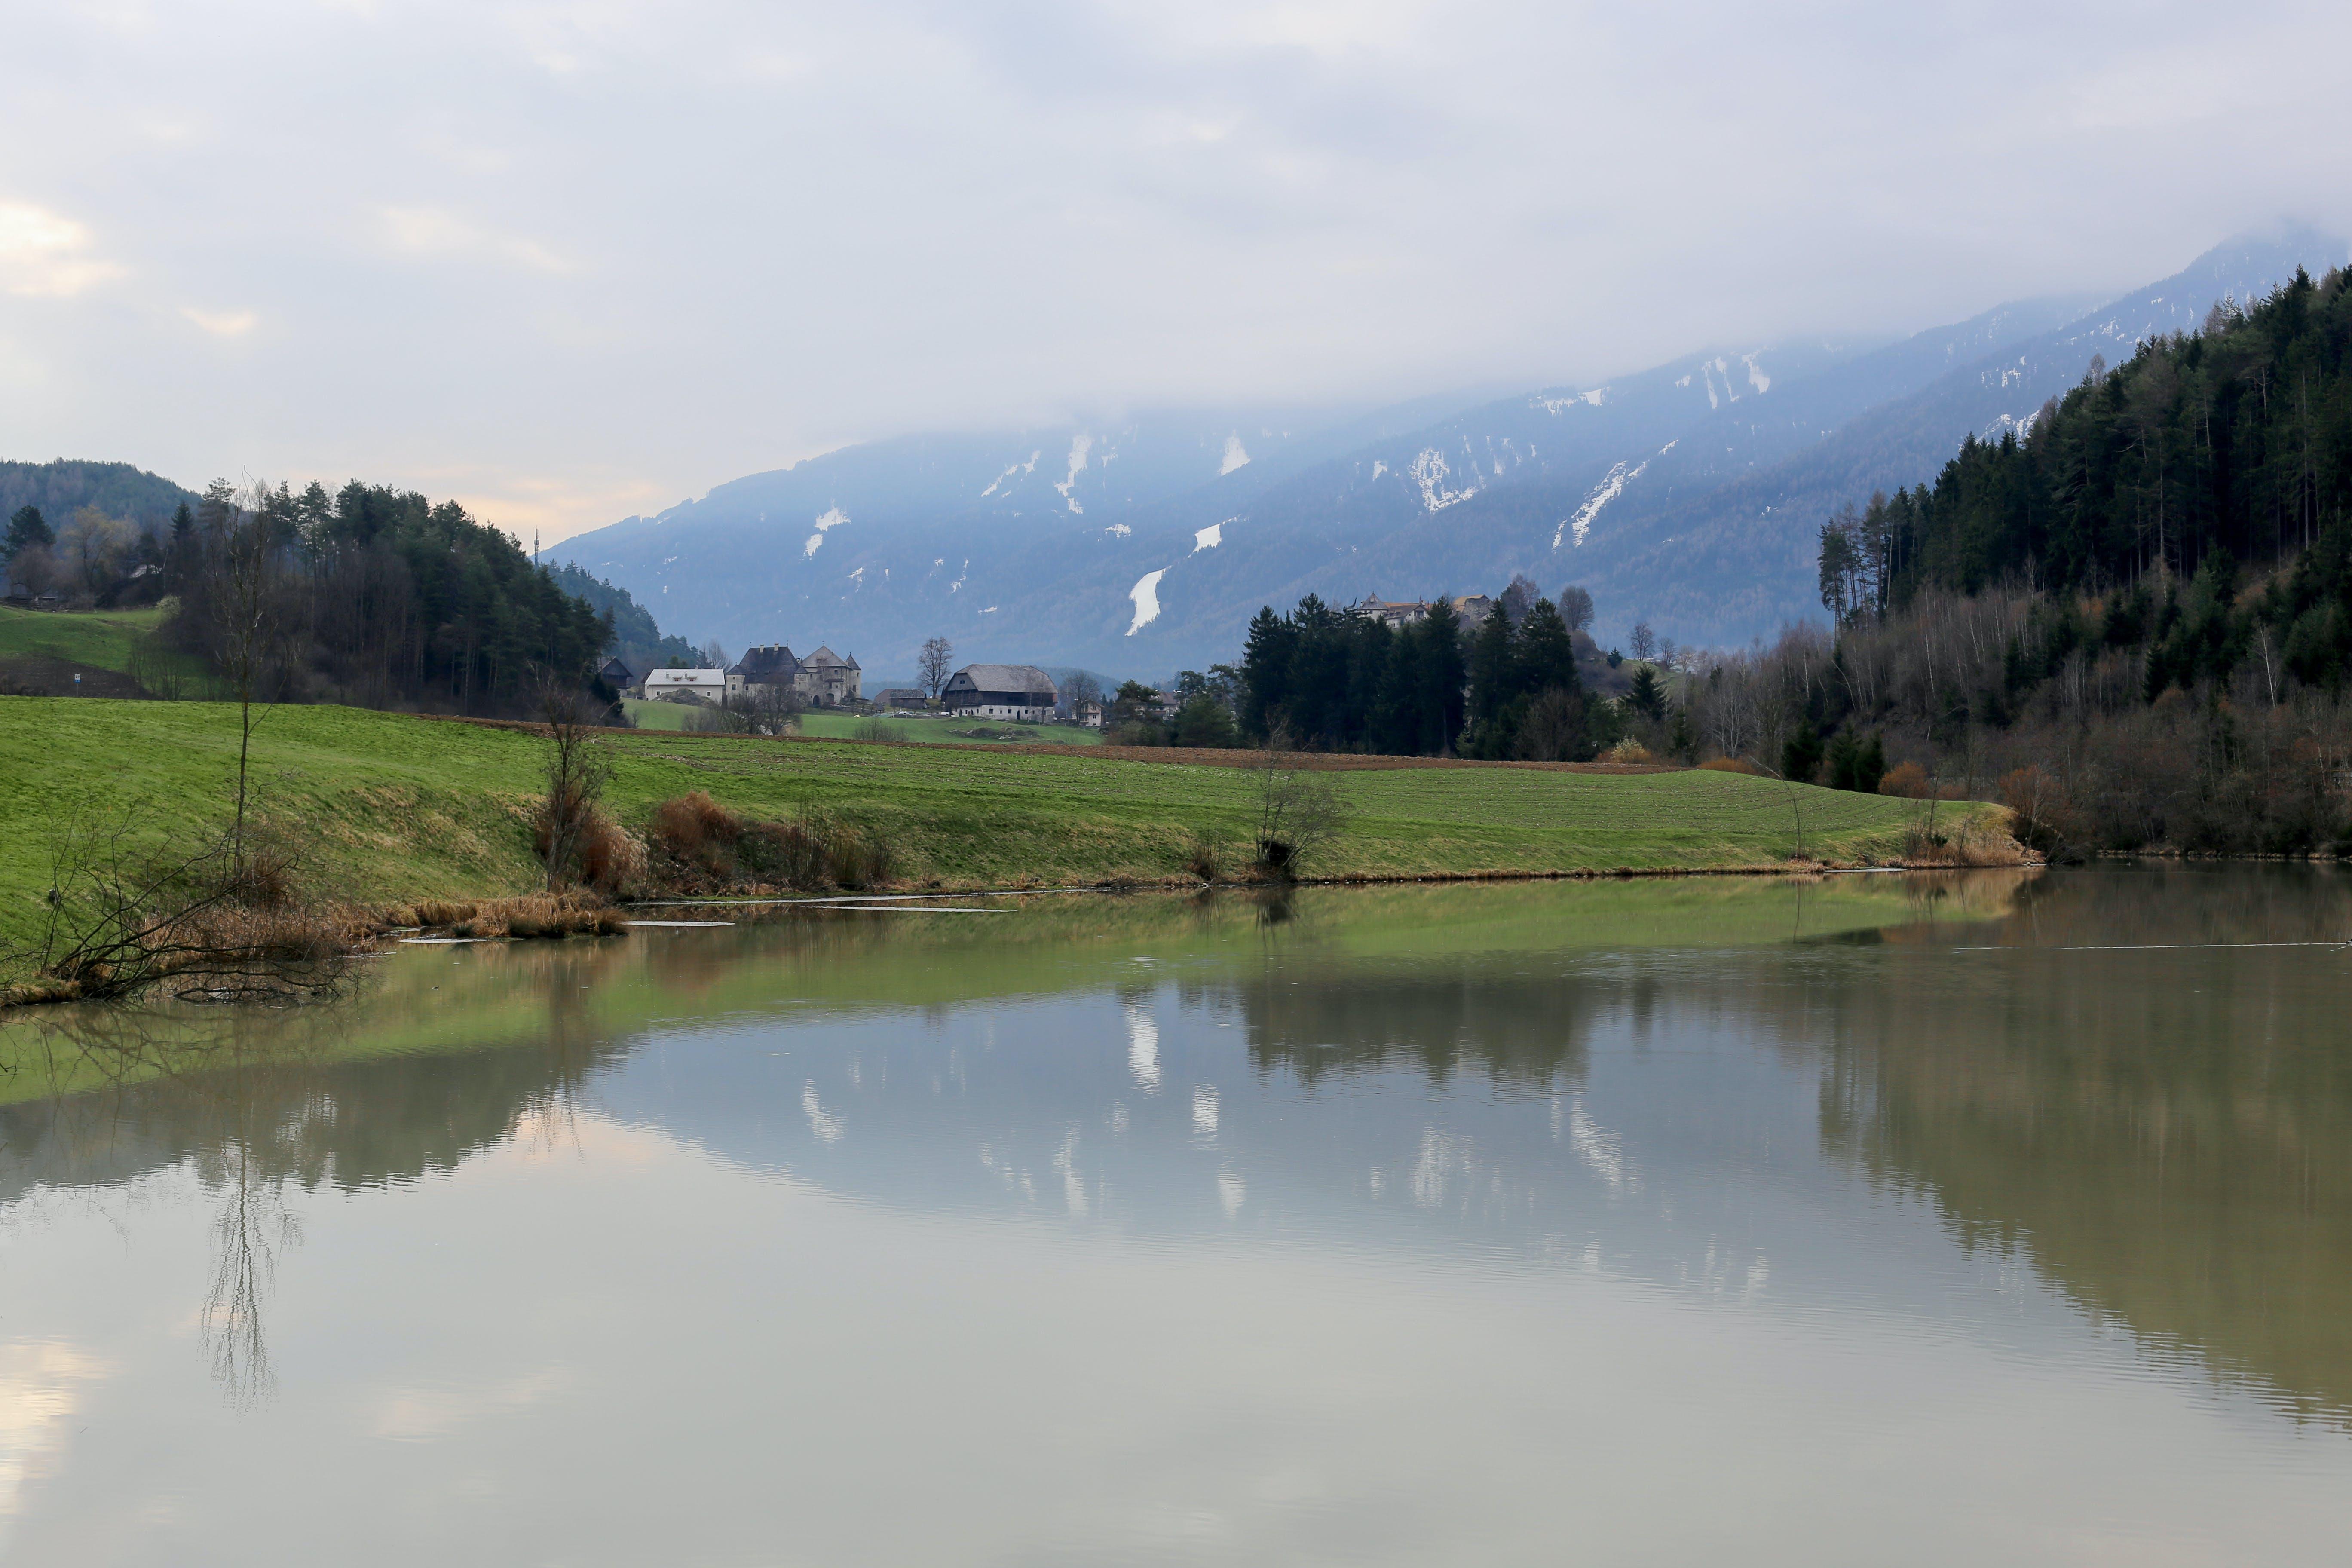 Landscape Photography of Green Grass Field Near River